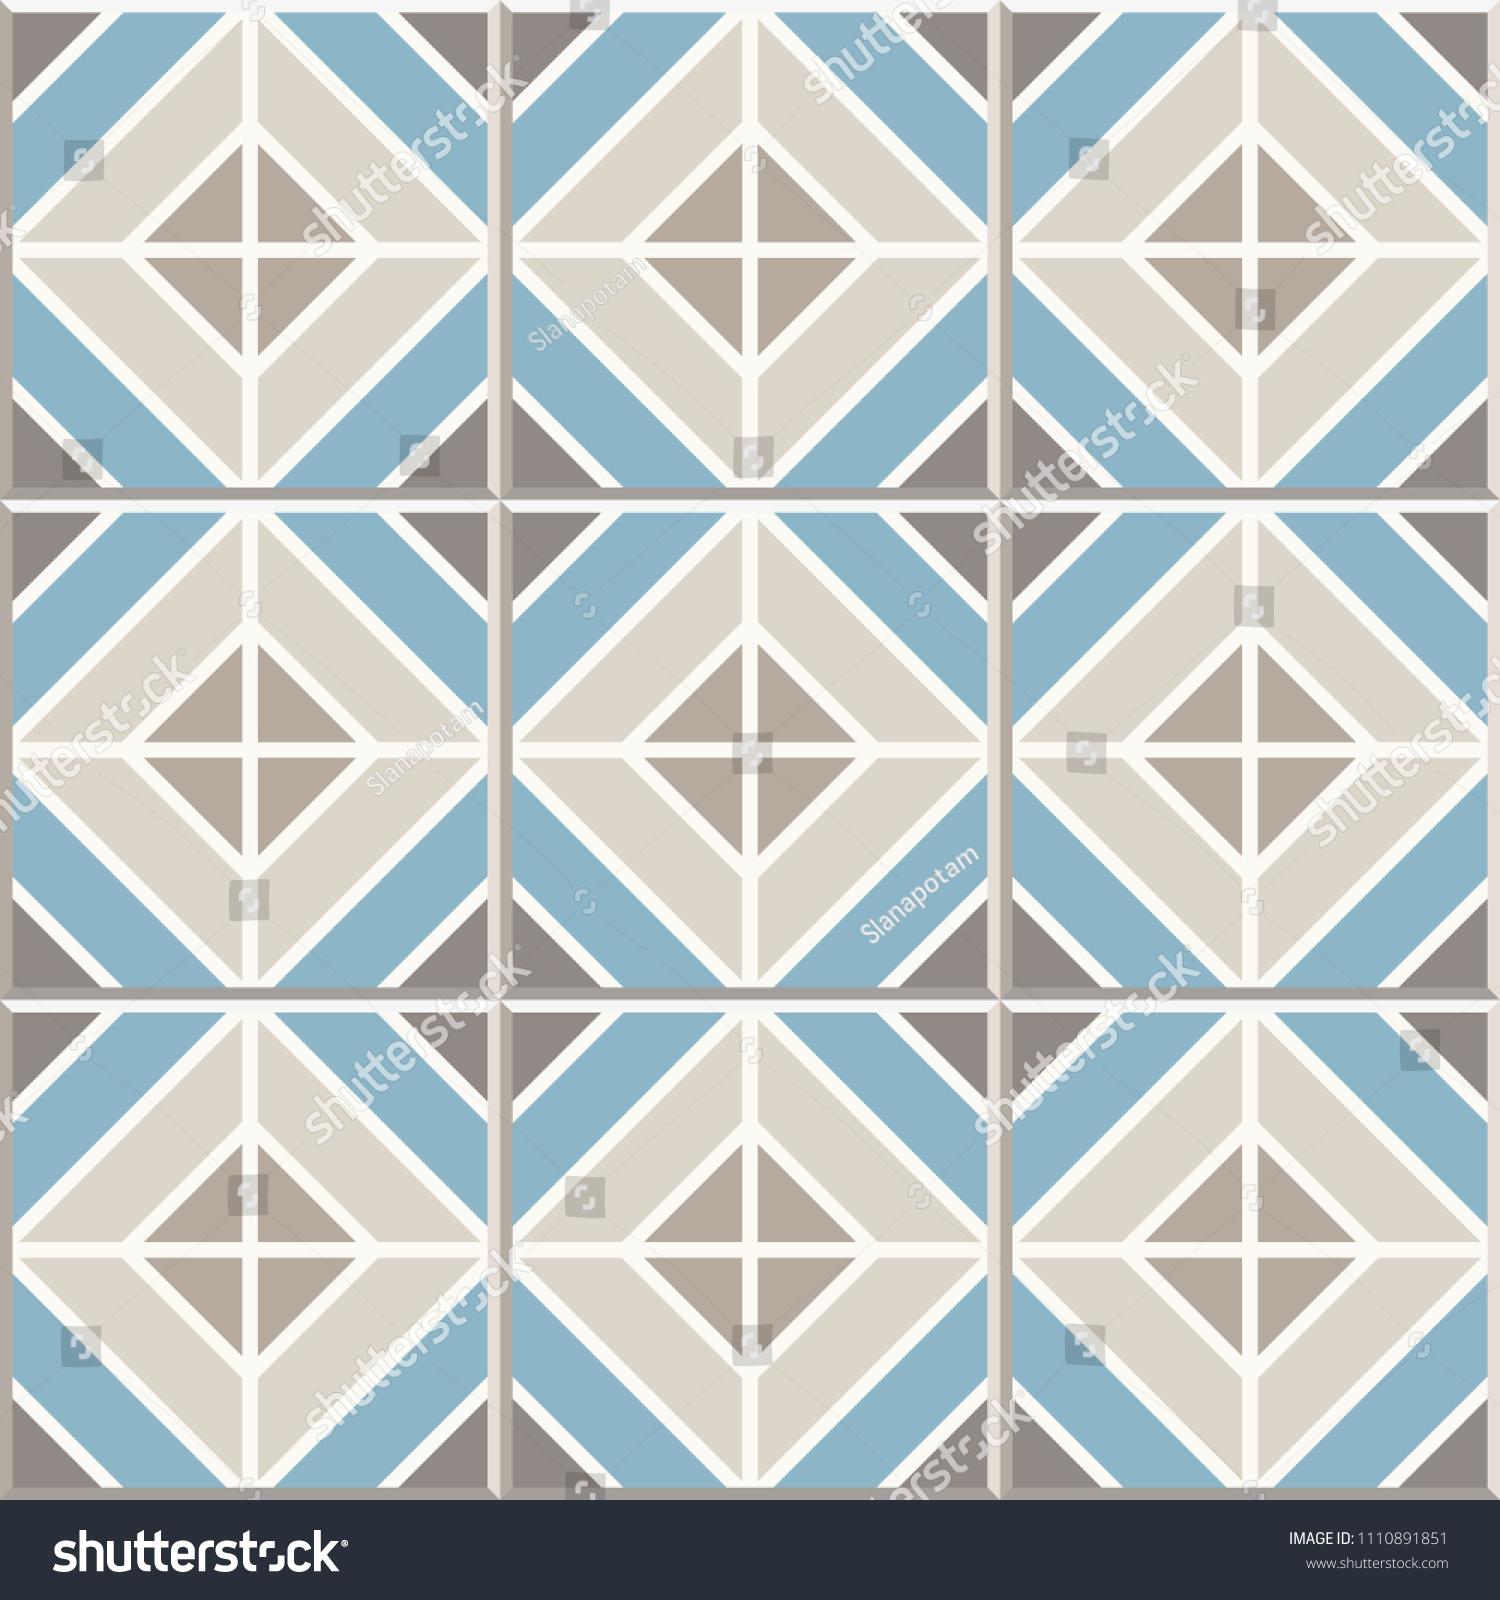 Ancient Floor Ceramic Tiles Flooring Tiling Stock Vector 1110891851 ...